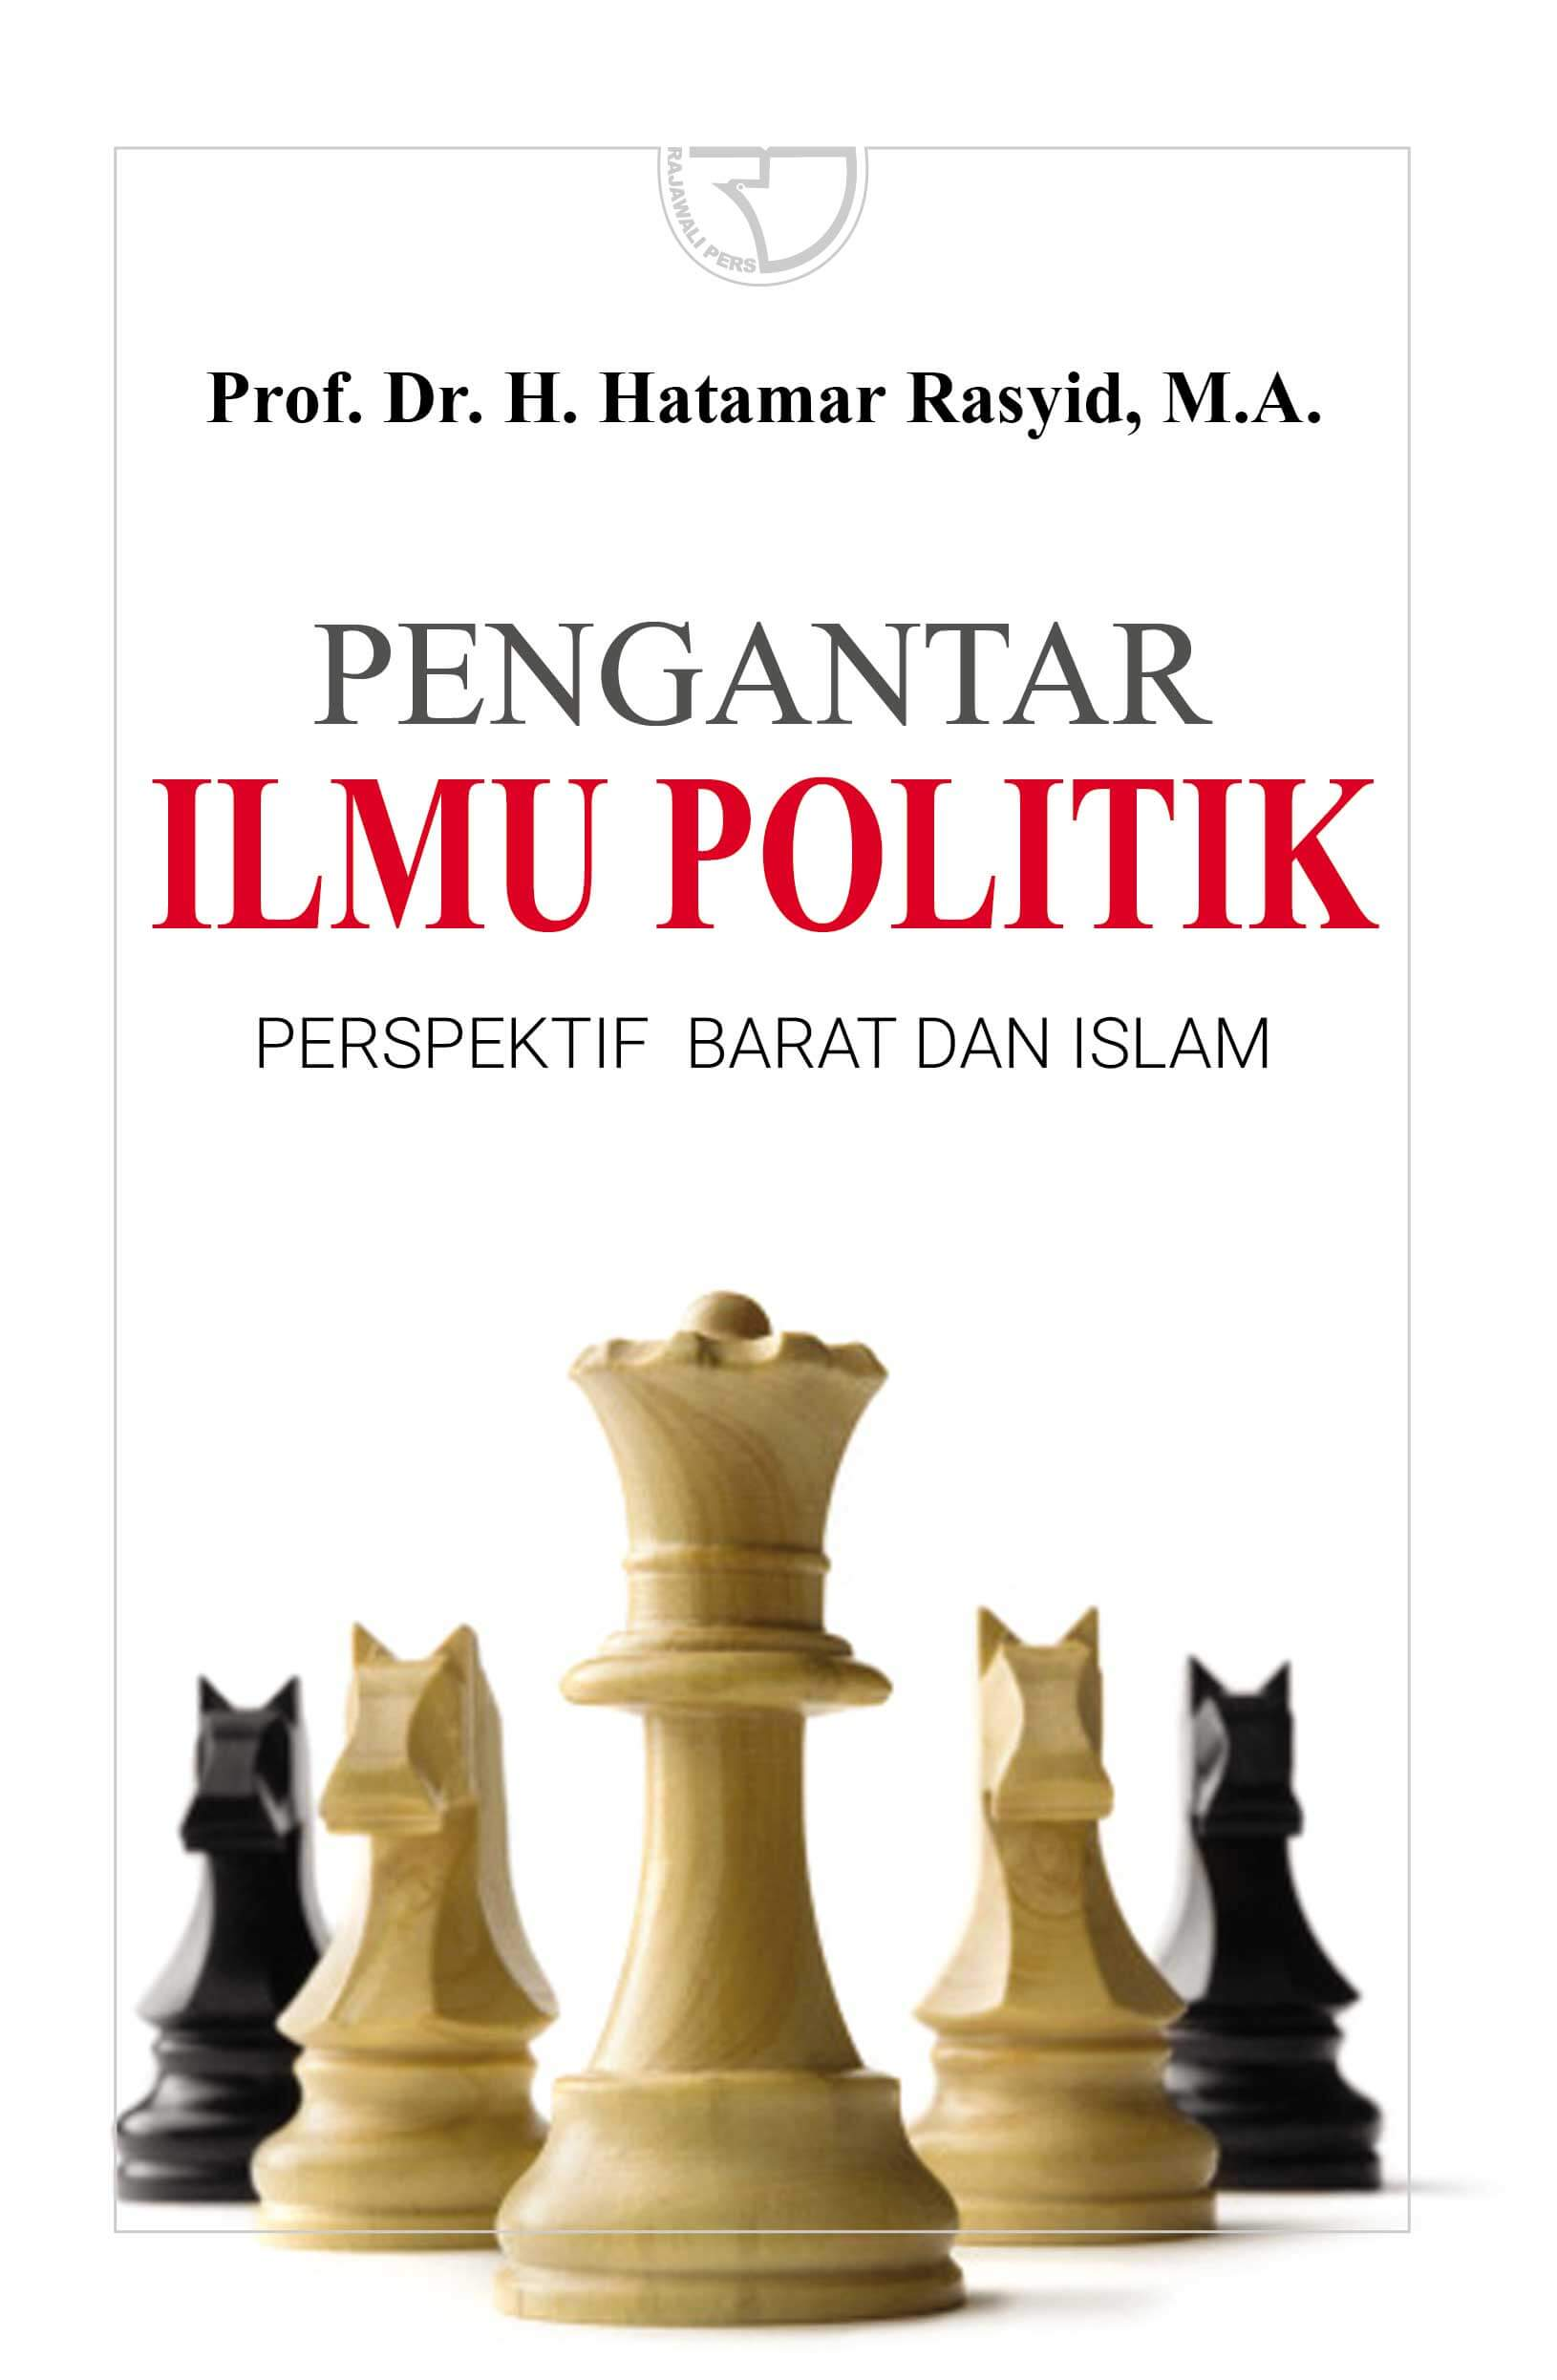 FREE EBOOK ILMU POLITIK ISLAM PDF